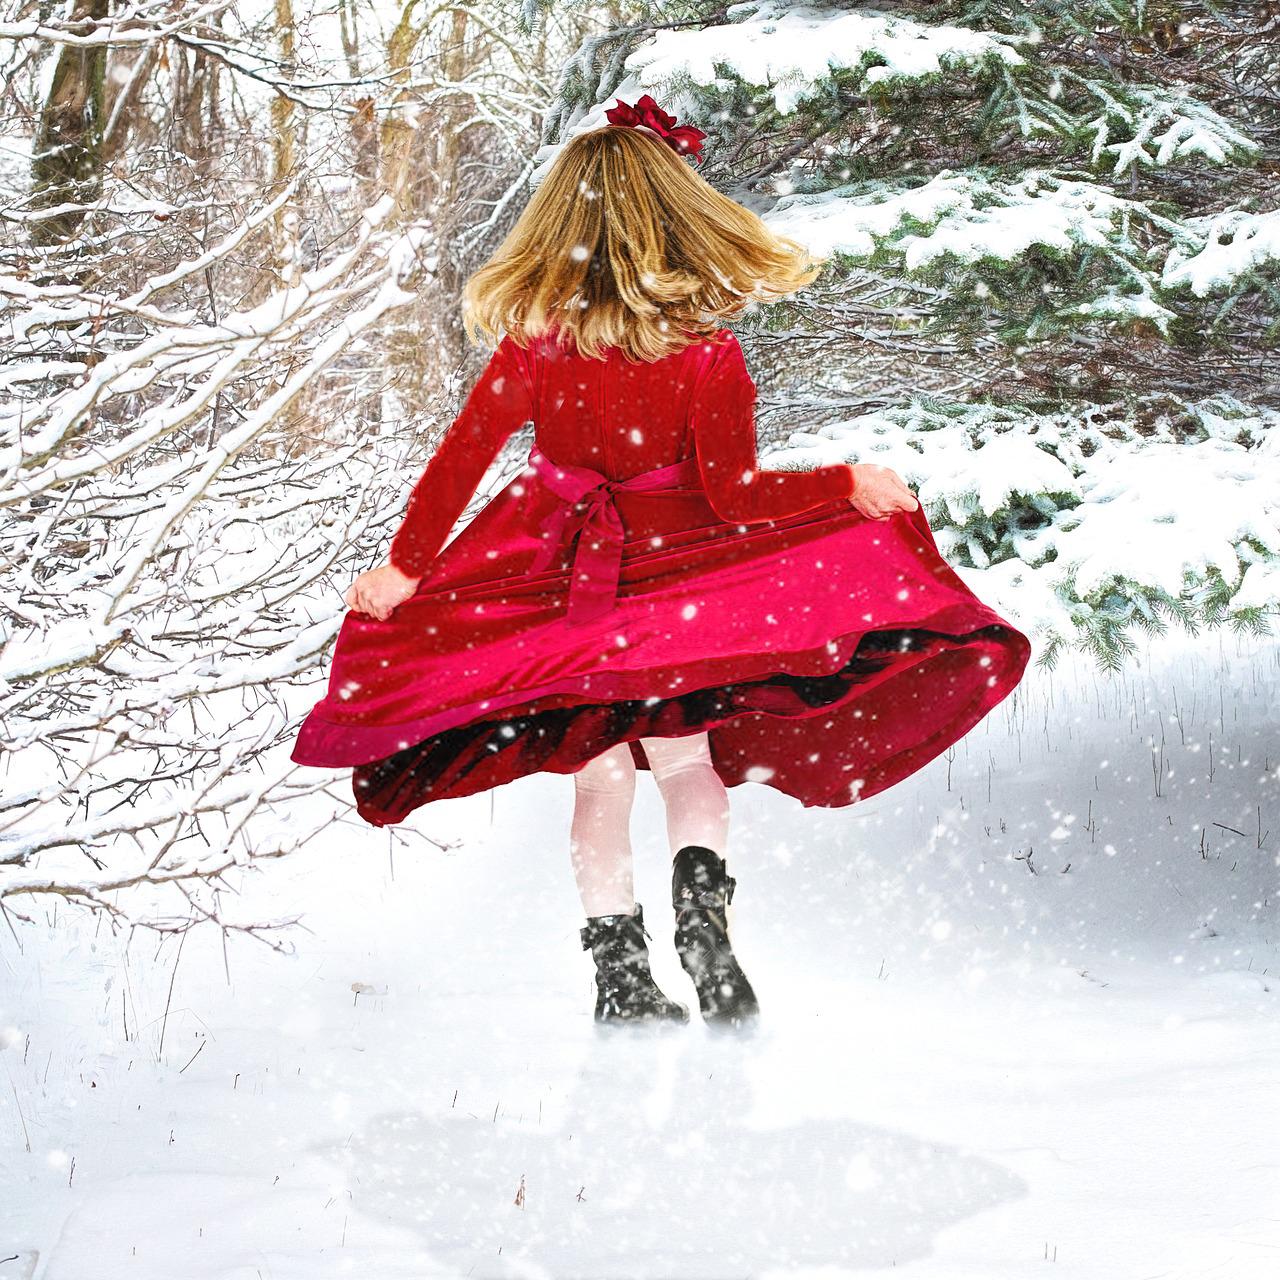 christmas-2970683_1920_2.jpg